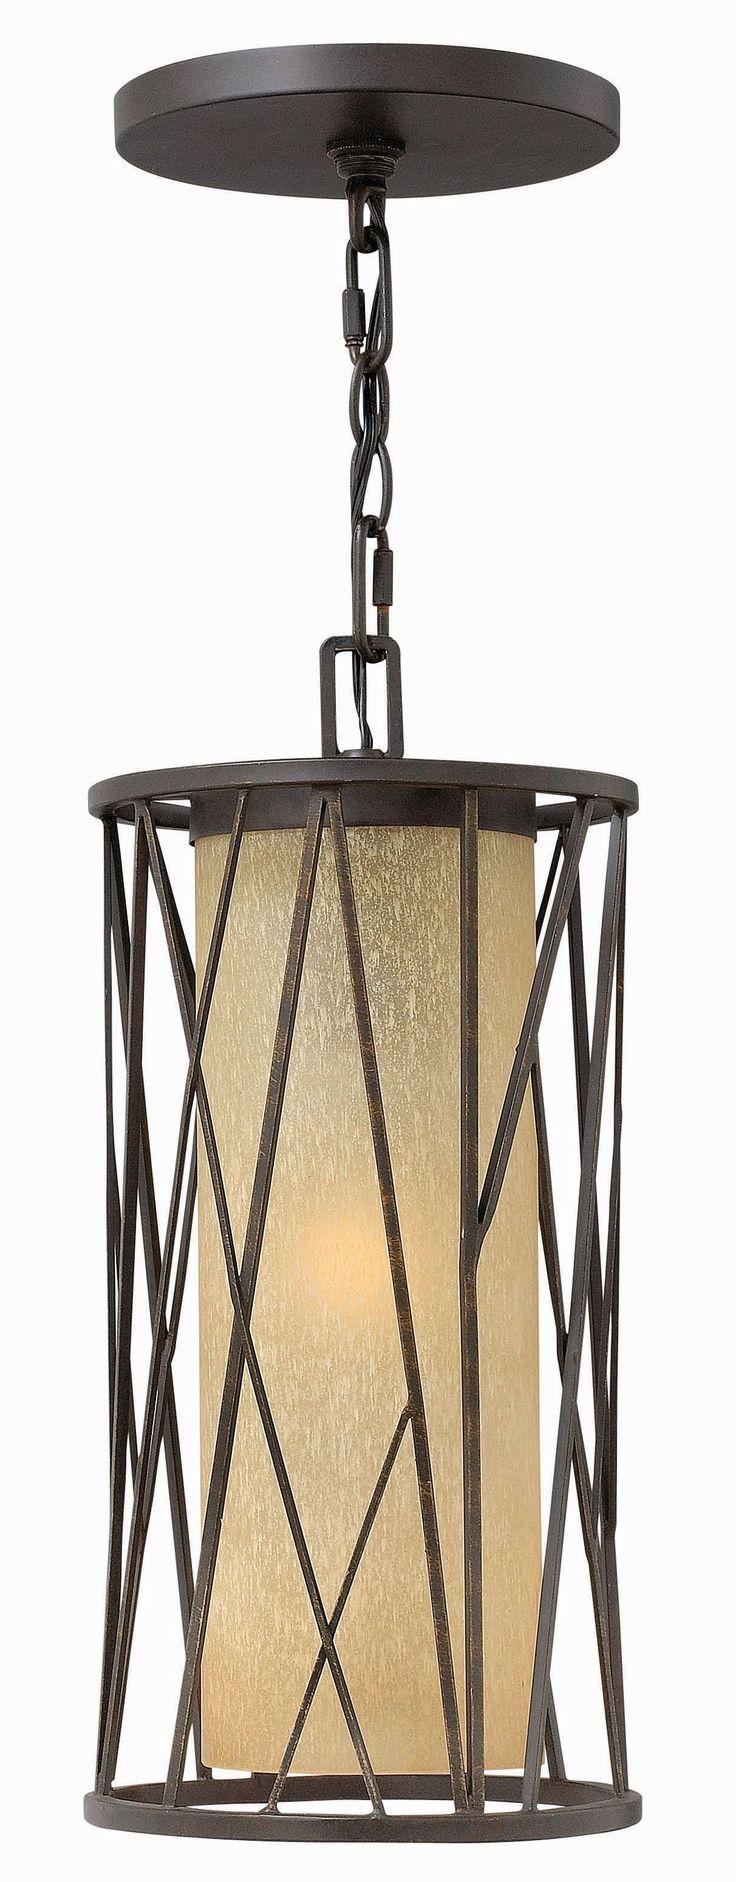 "CanadaLightingExperts | Elm - 17.5"" 15W 1 LED Outdoor Hanging Lantern"